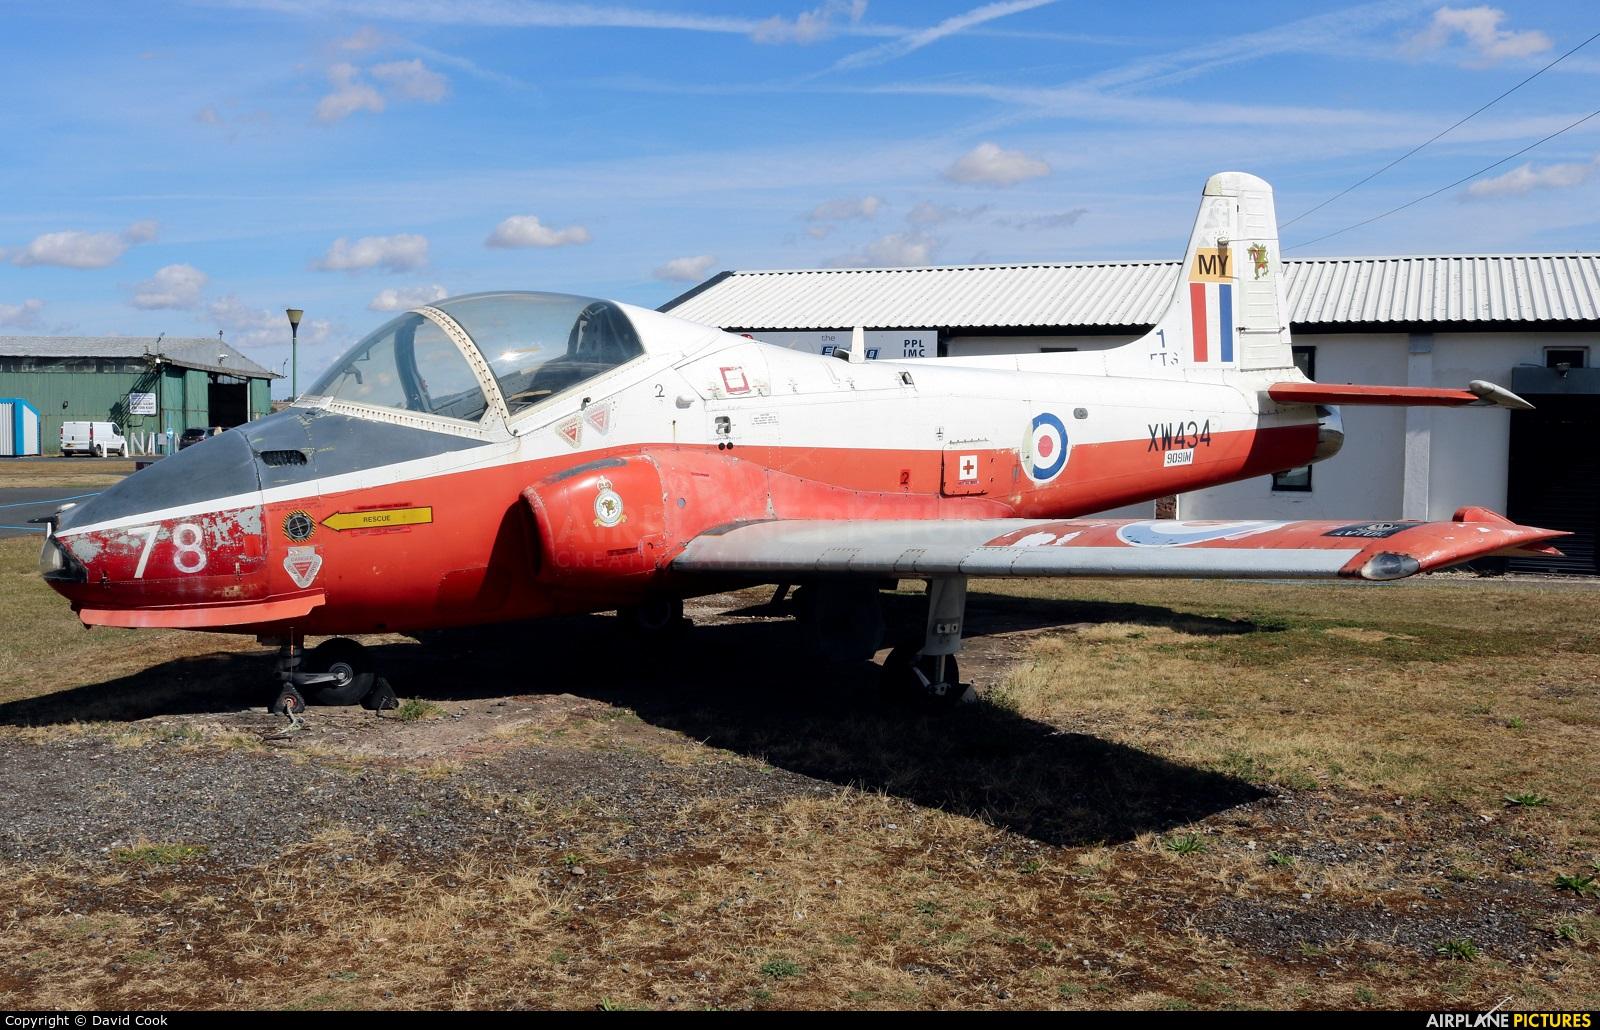 Royal Air Force XW434 aircraft at Wolverhampton - Halfpenny Green